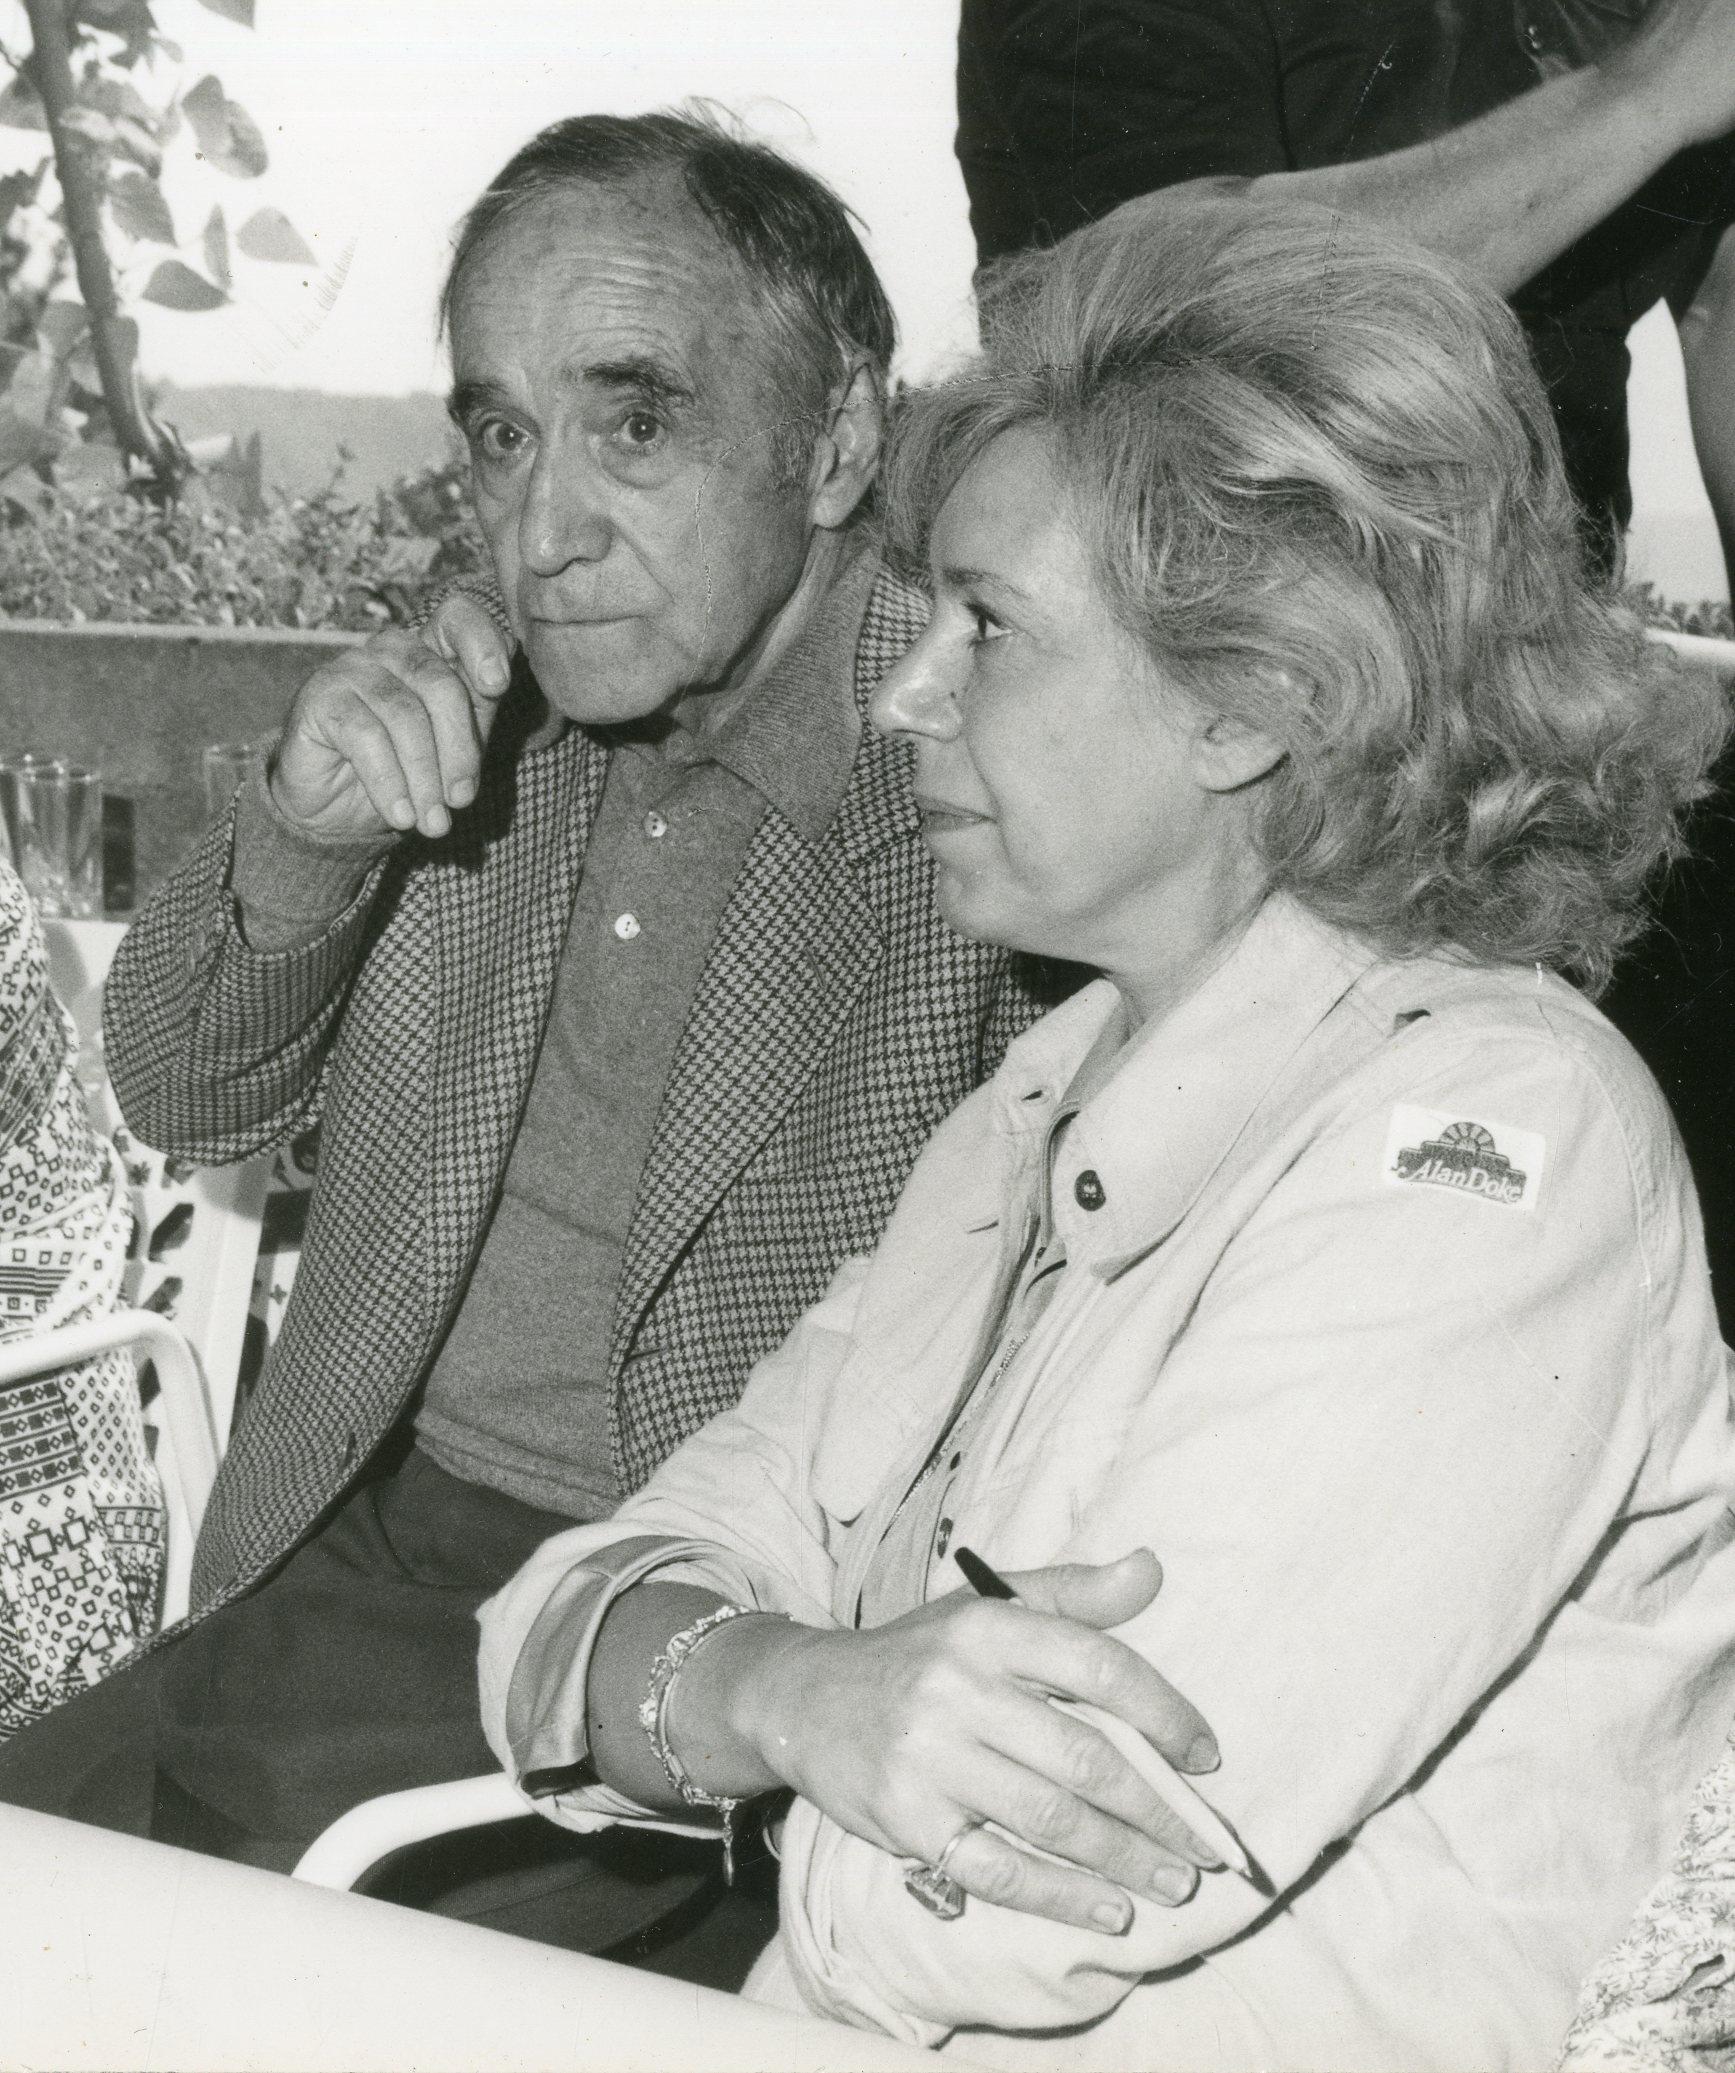 1978_Ciampella_Bertolucci_Rosaria_Mino_Maccari